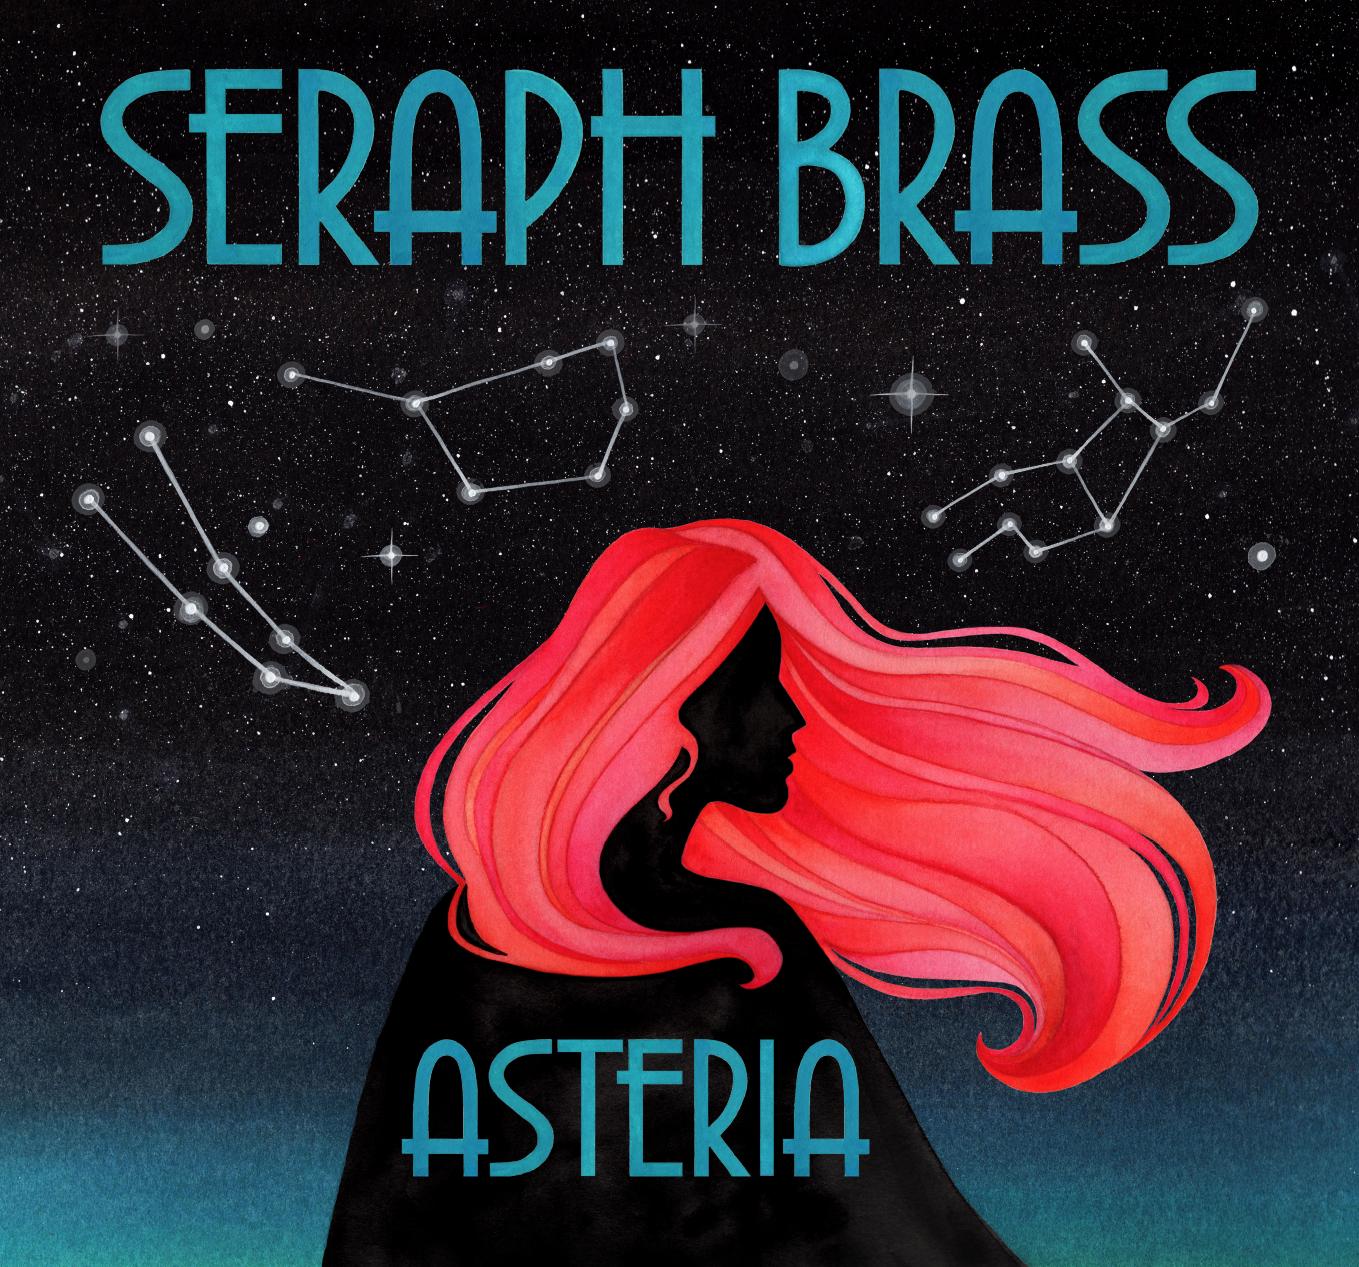 Seraph Brass Asteria